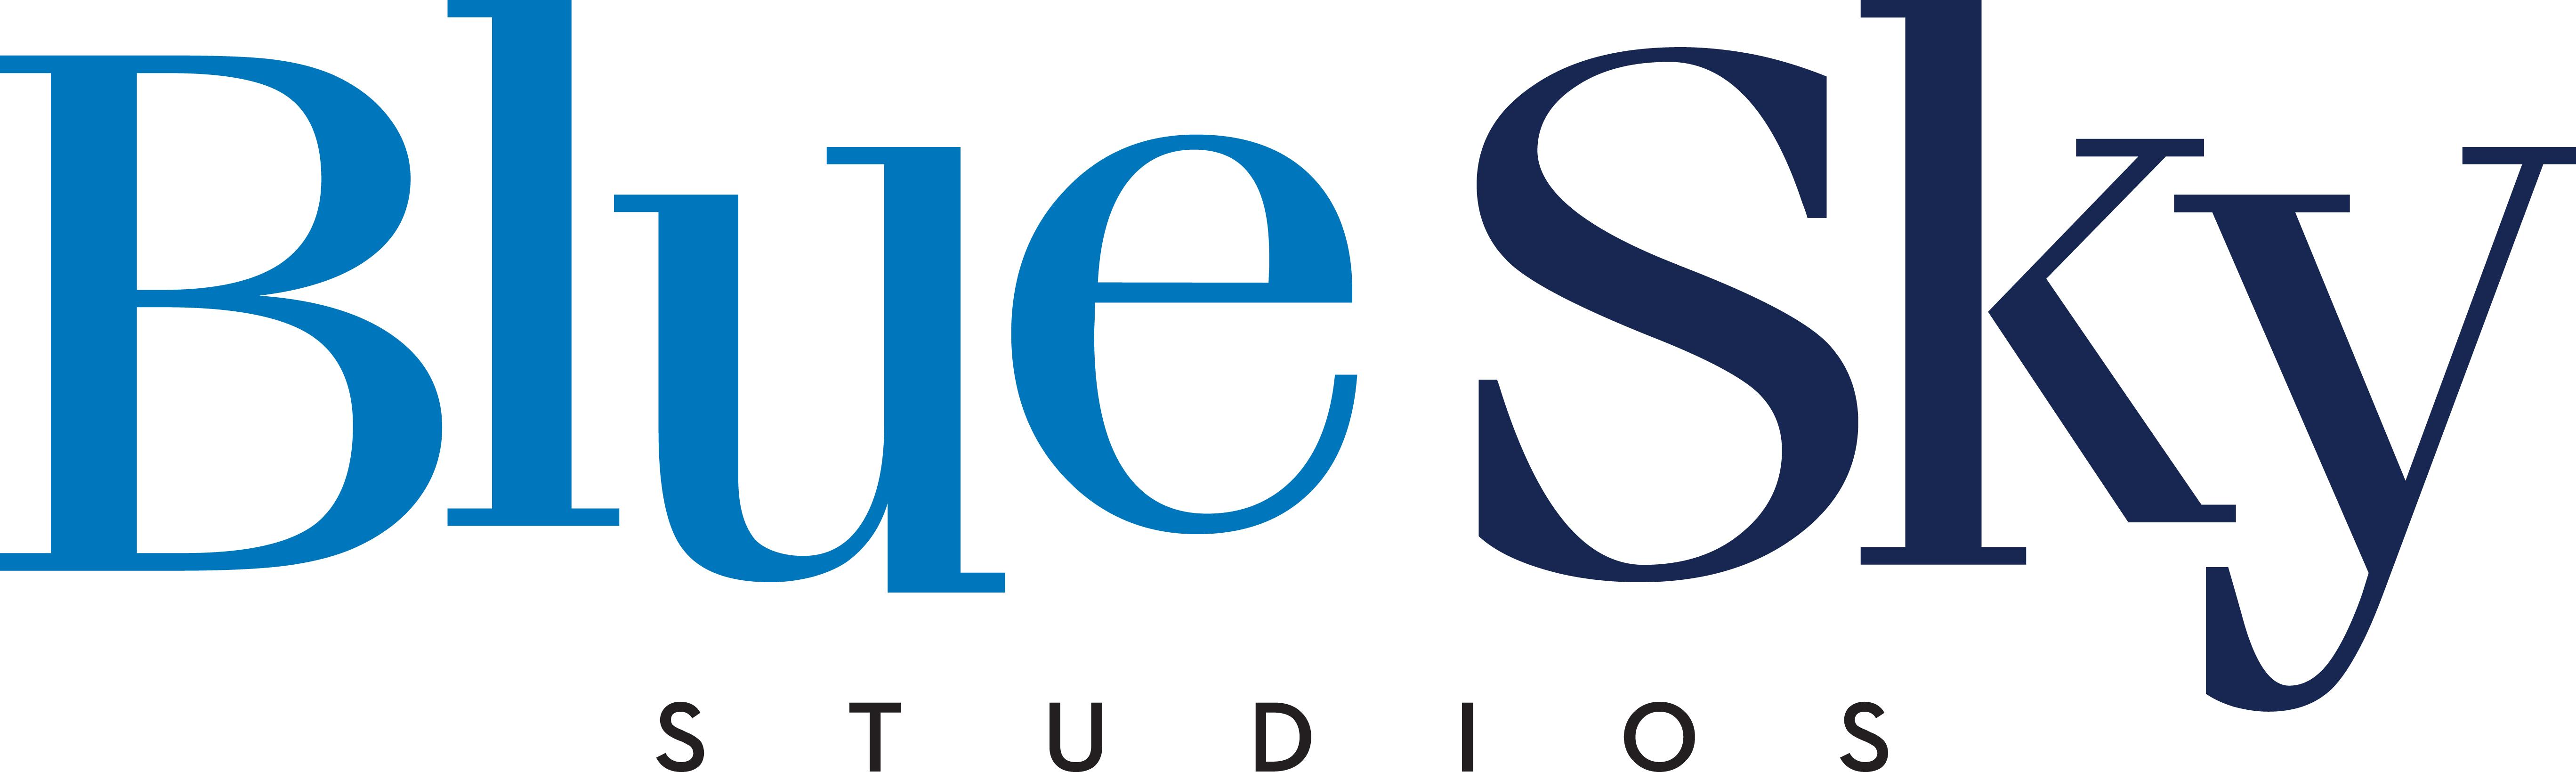 Blue Sky Studioslogo